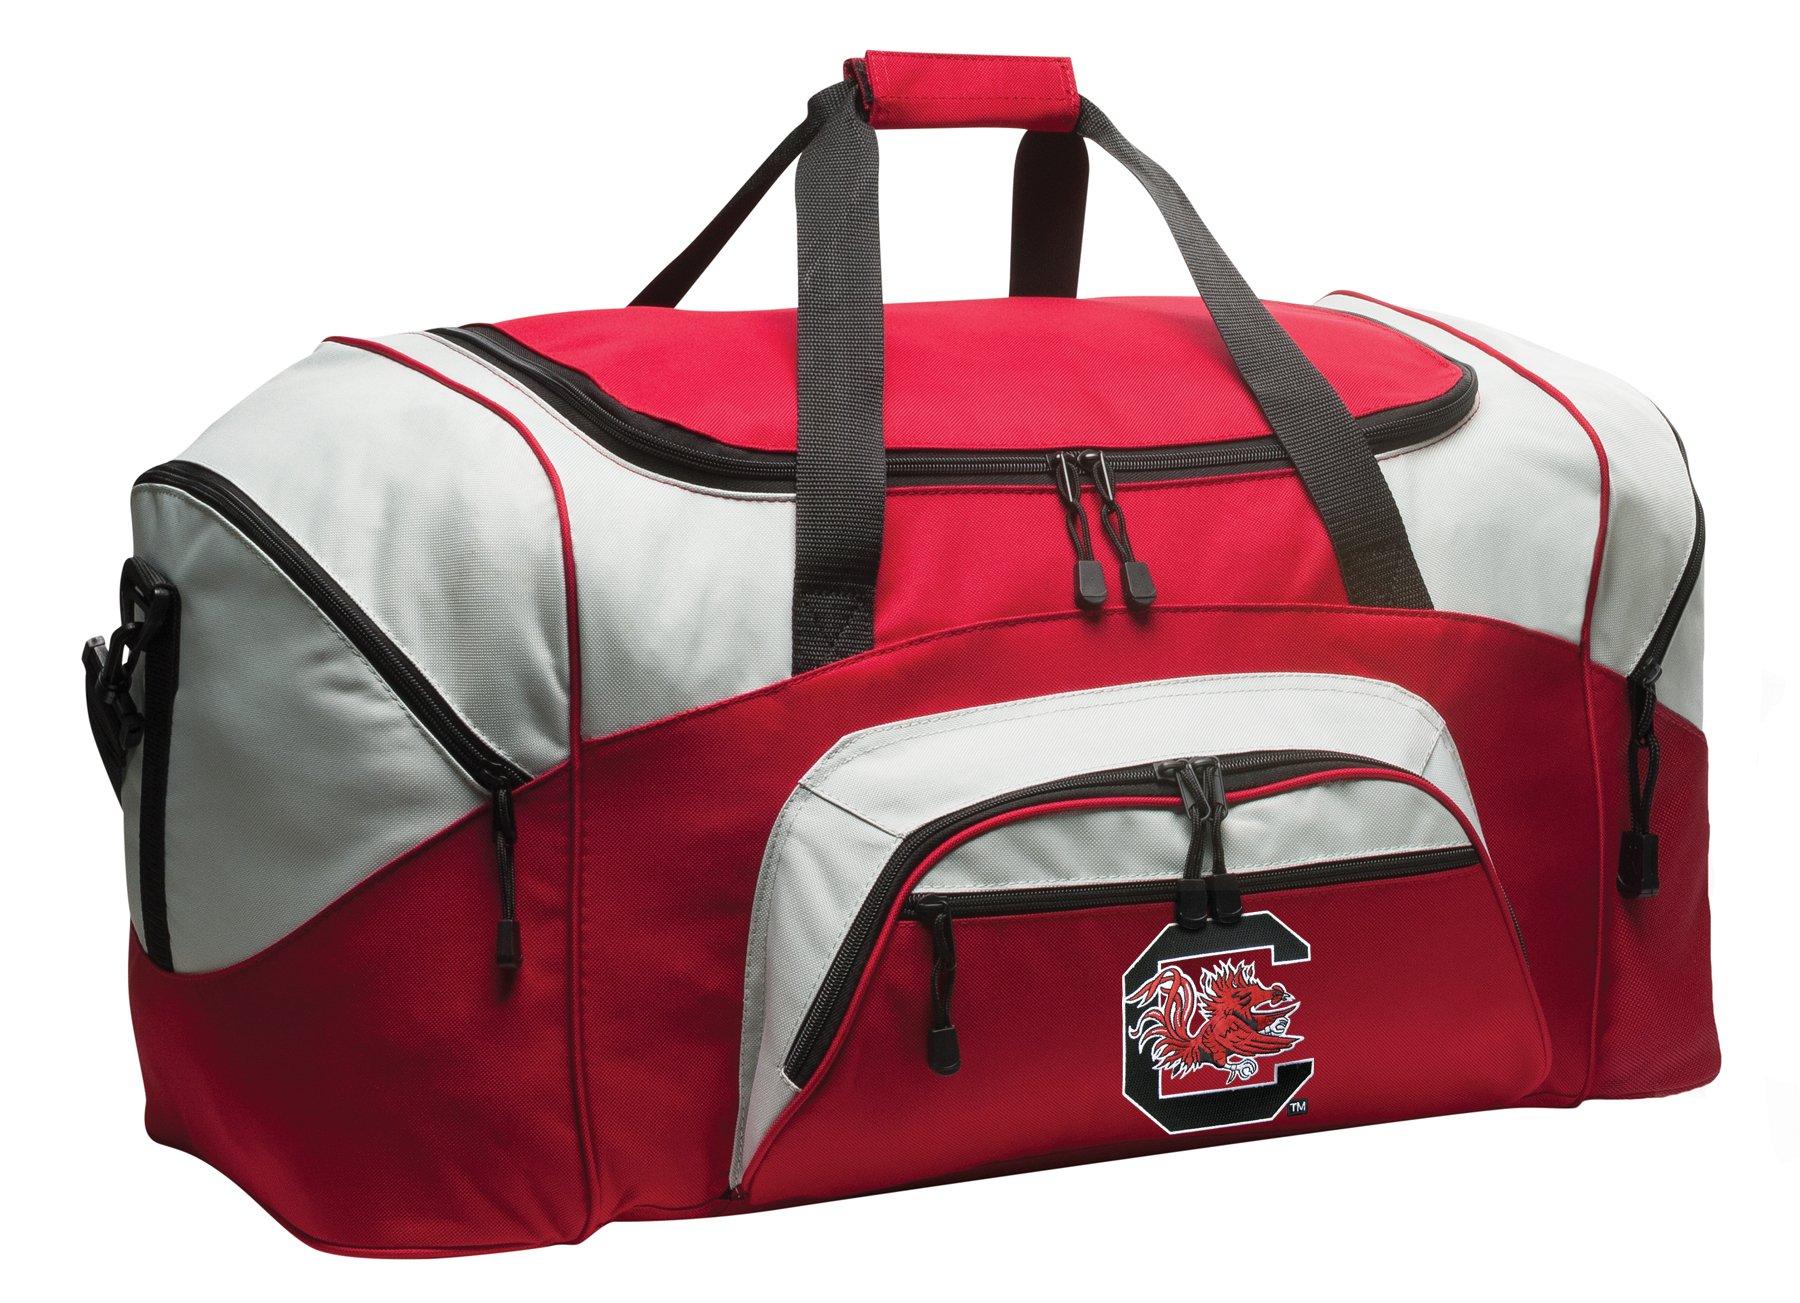 DELUXE South Carolina Gamecocks Duffel Bag University of South Carolina Gym Bag